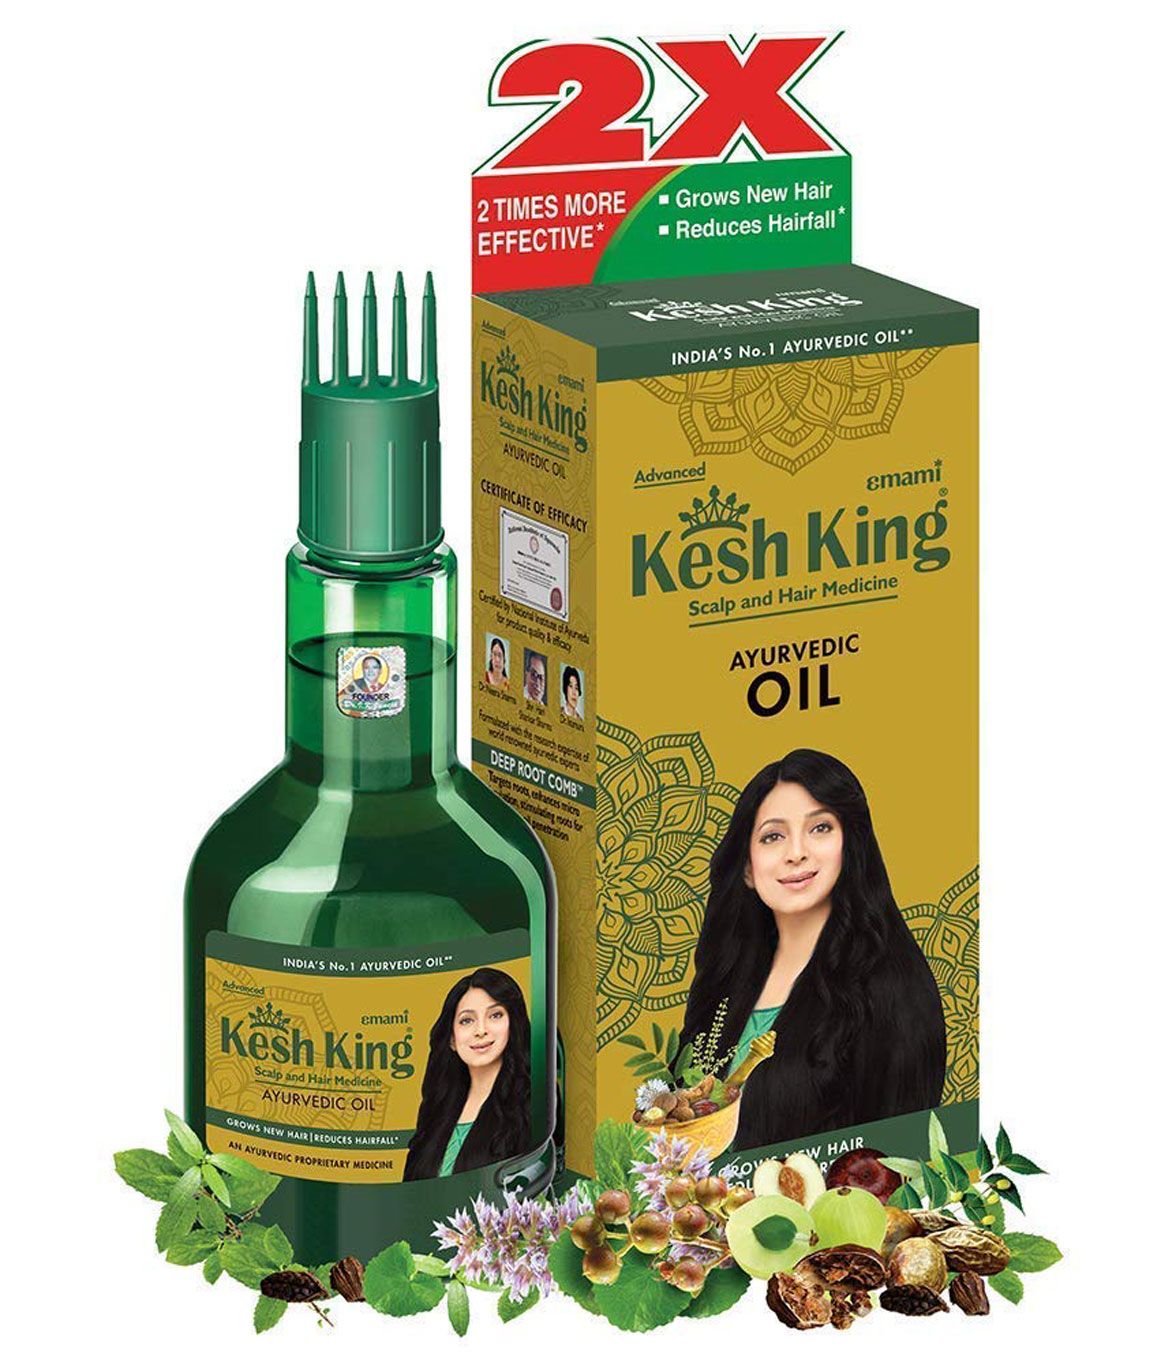 Kesh King Ayurvedic Scalp and Hair Oil, 60ml (60ml - Pack of 2)